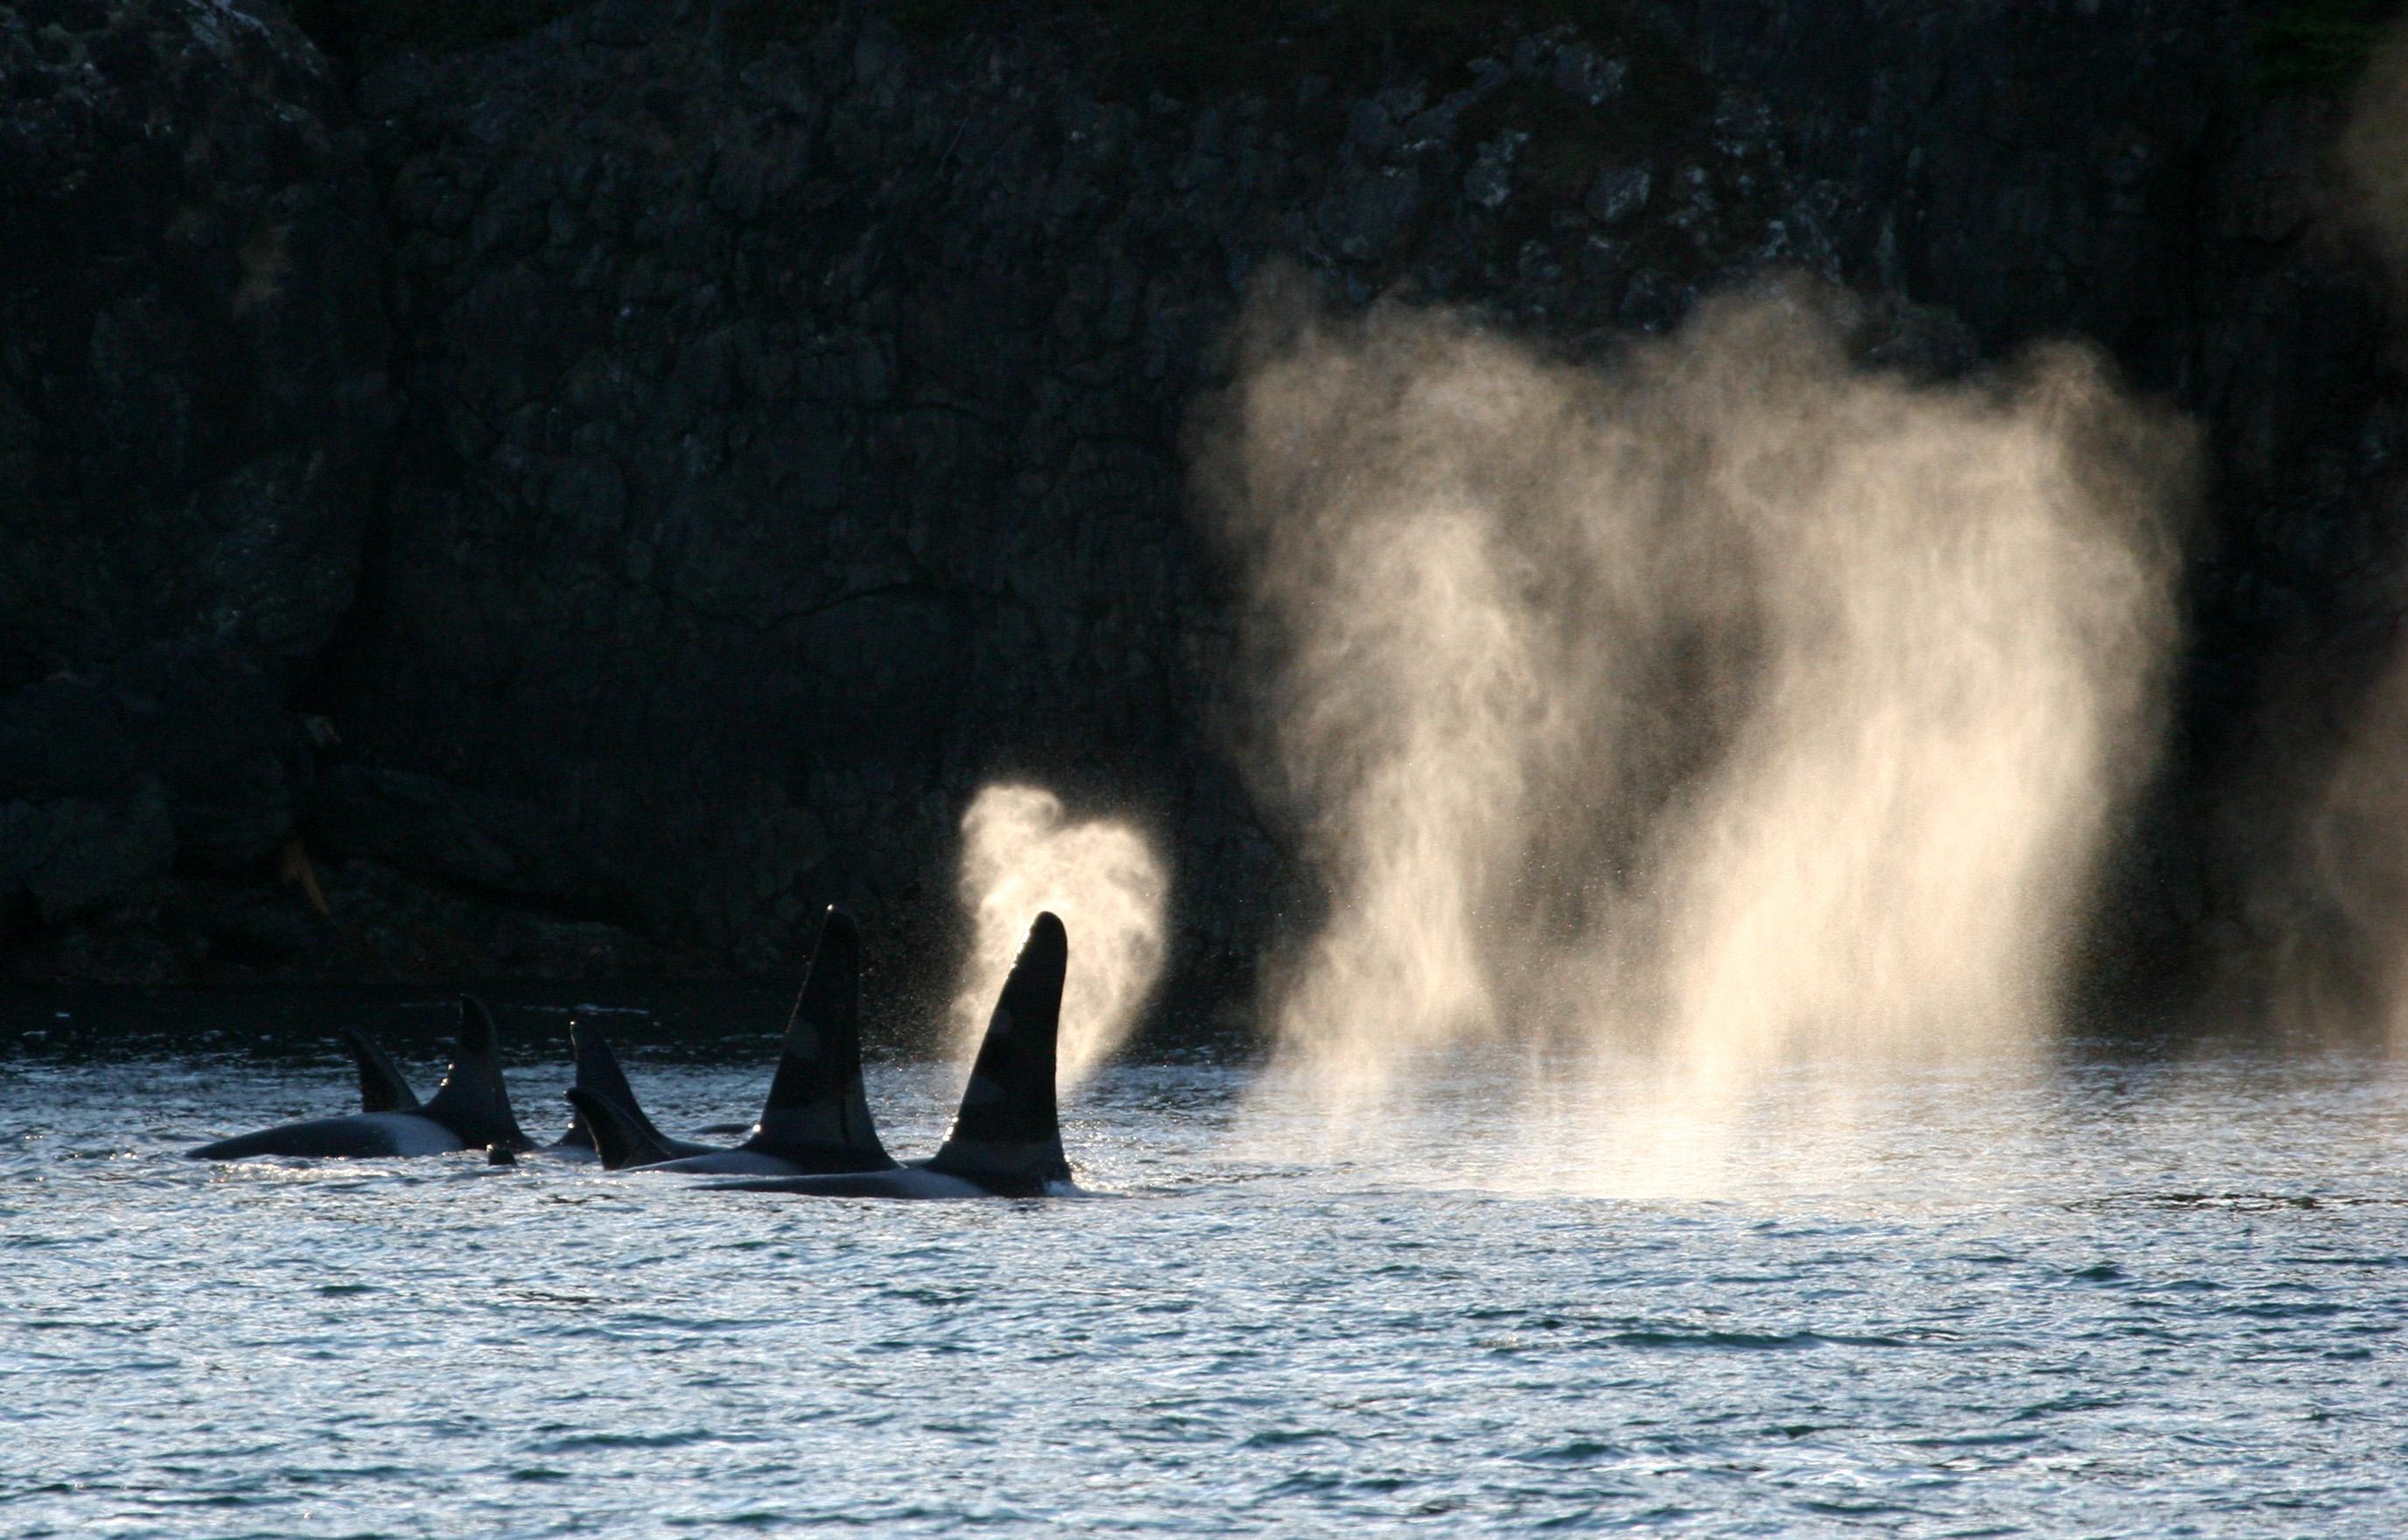 Ocean Pollution and Orcas